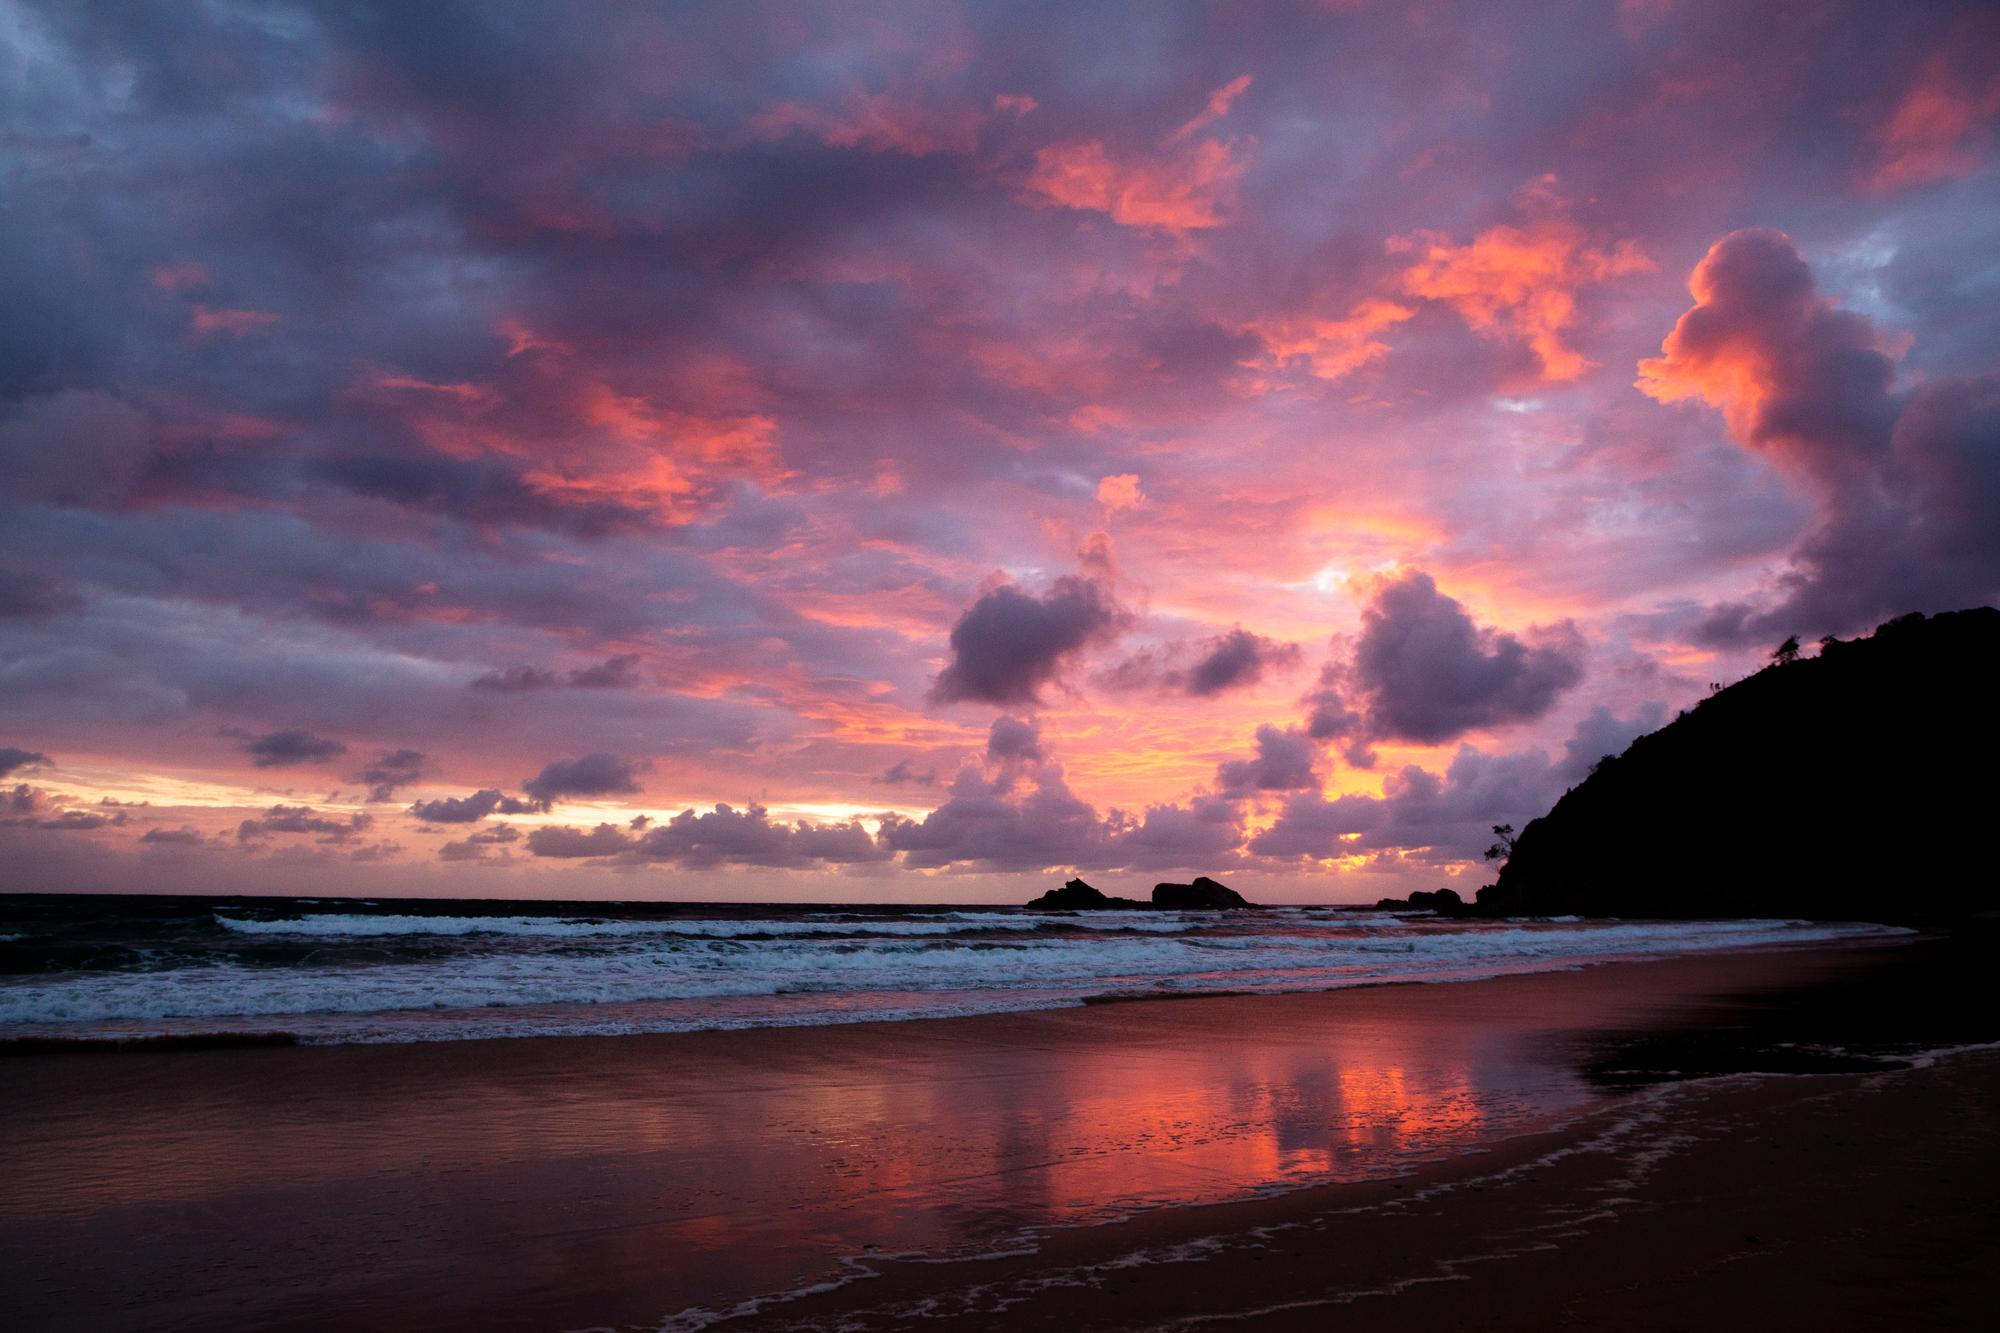 40-Bec_Kilpatrick_Photography_AustraliaIMG_3224